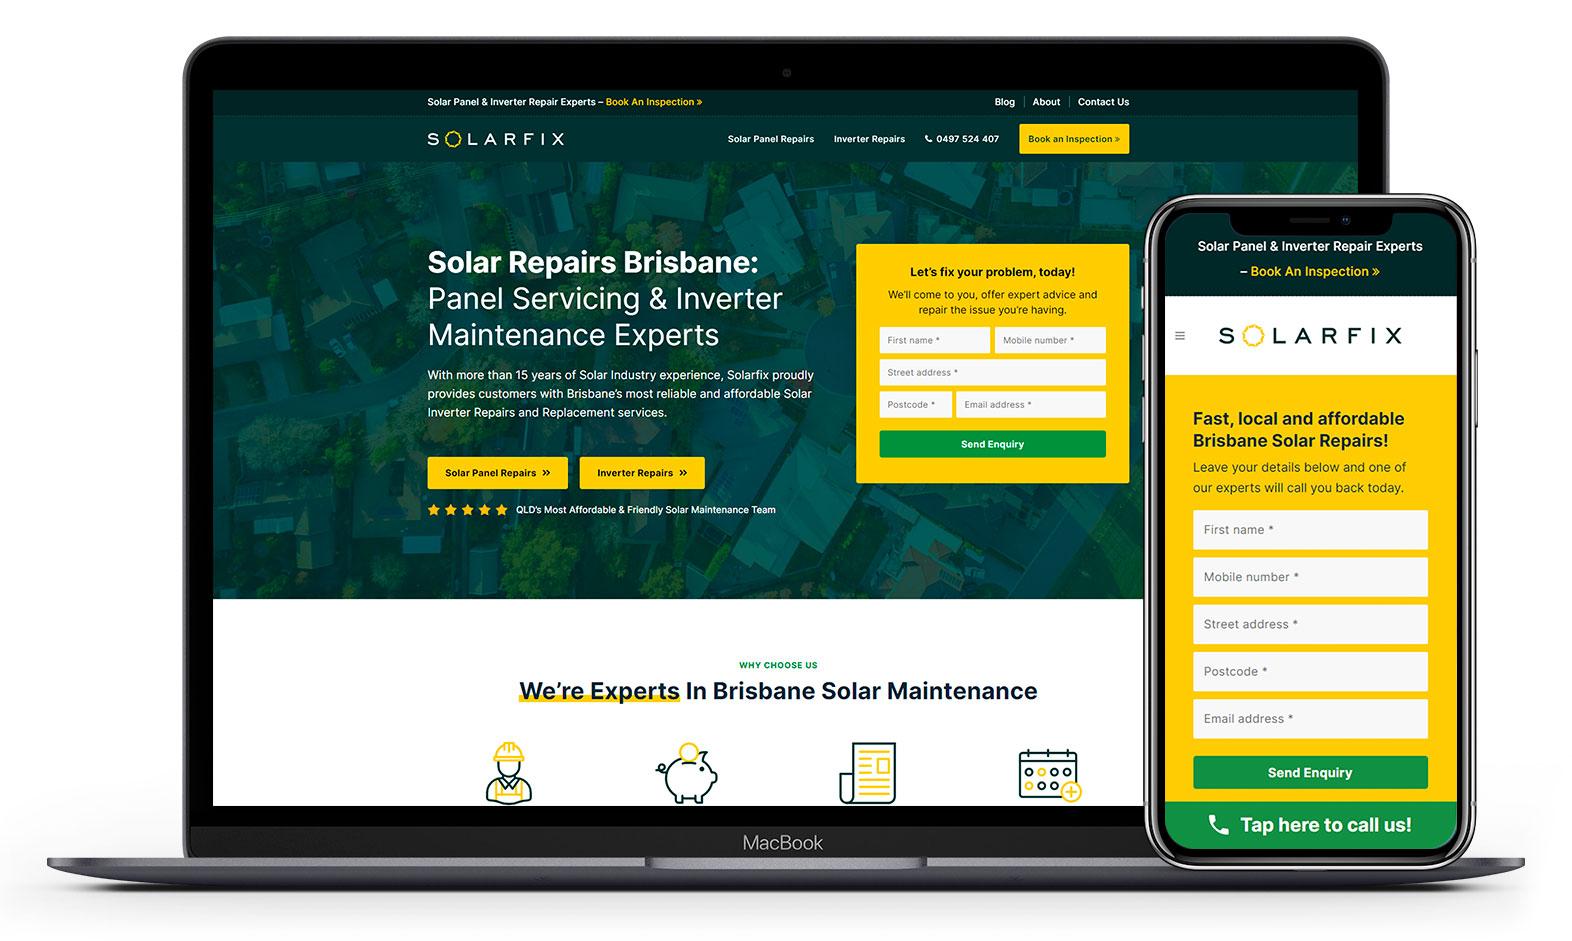 Solarfix's website design displayed on responsive devices